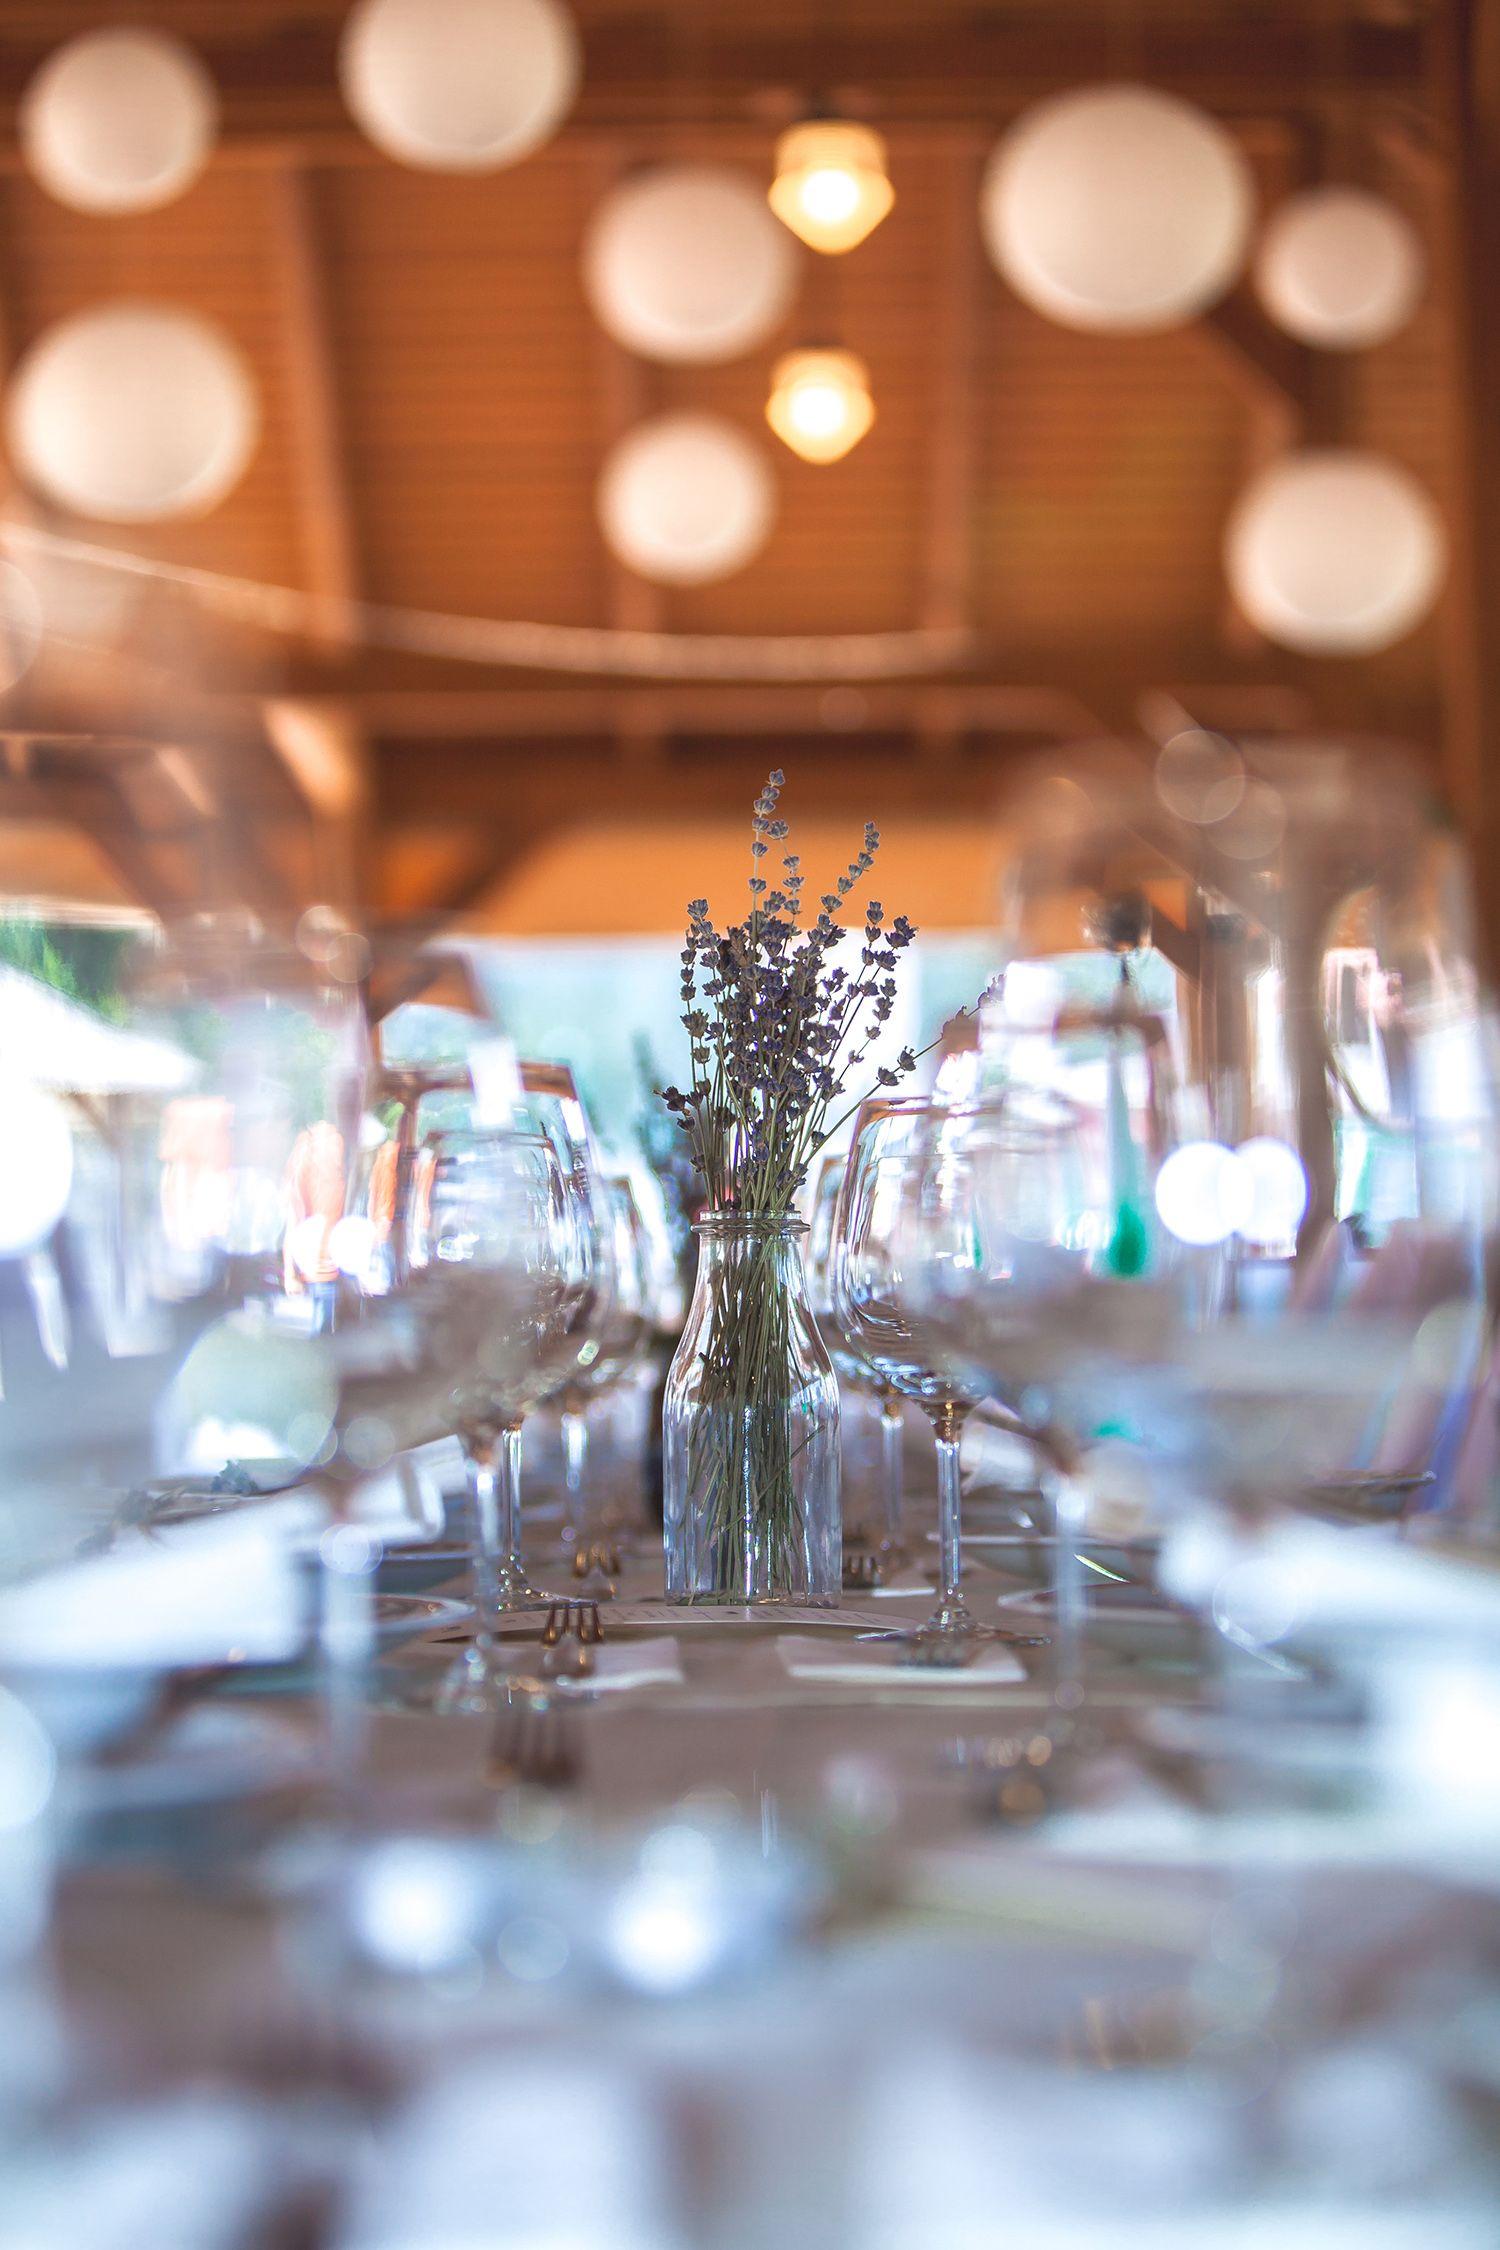 Wedding decor wedding design diy lamarin design table wedding decor wedding design diy lamarin design table decoration junglespirit Image collections